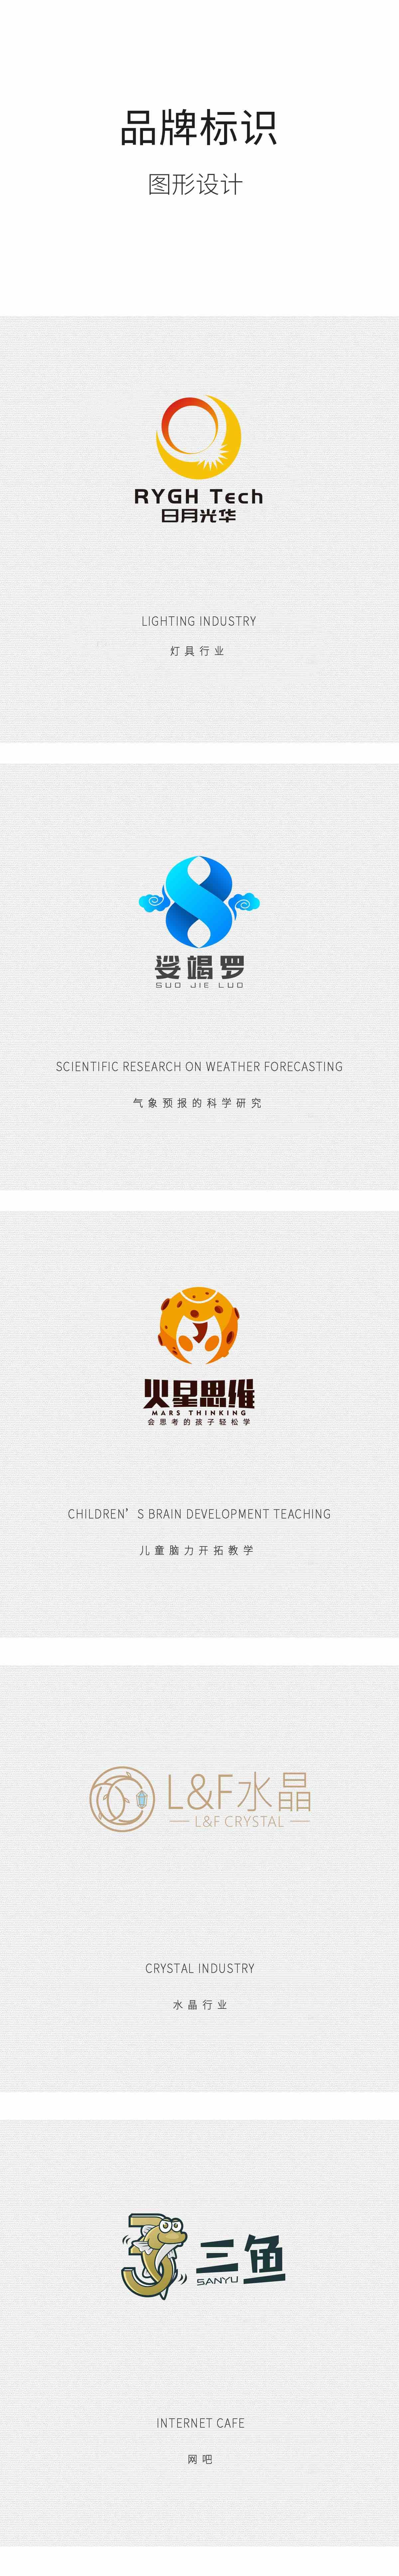 图形设计logo